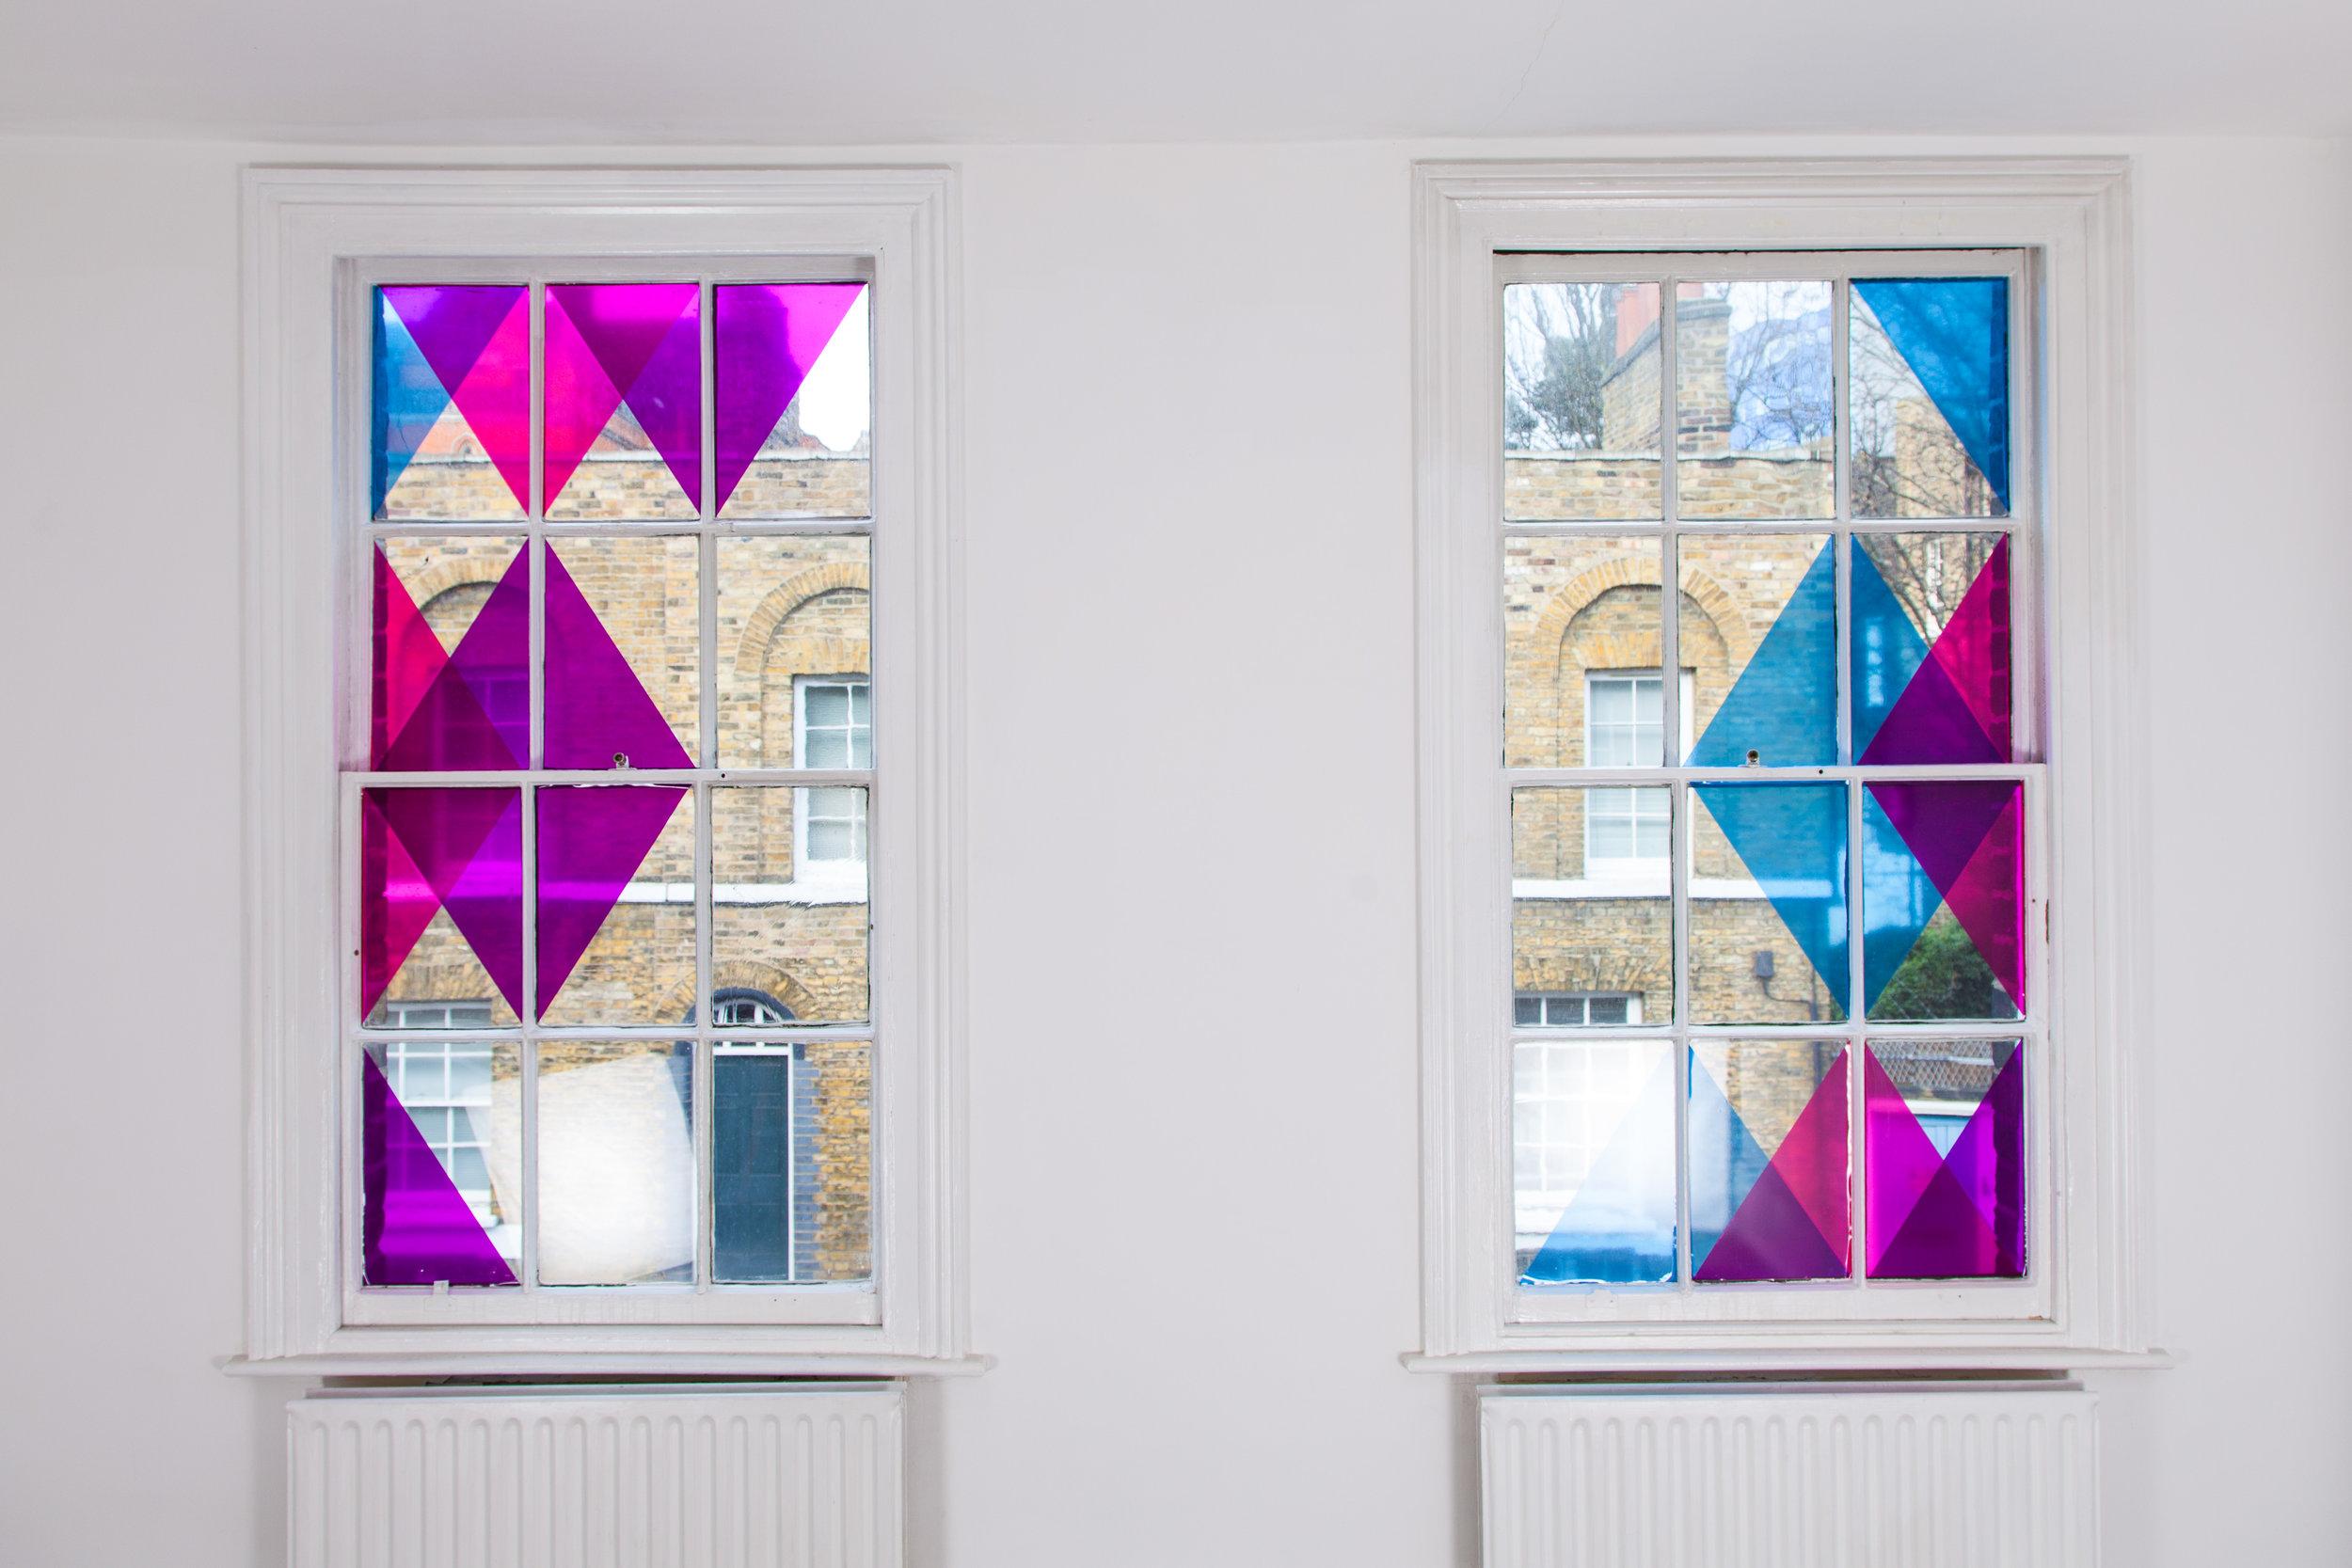 Fiona Grady, Mancini Moments, 2018, Hand cut vinyl window installation, variable dimensions. Photograph by Ekphrasis © dateagleart 2018.